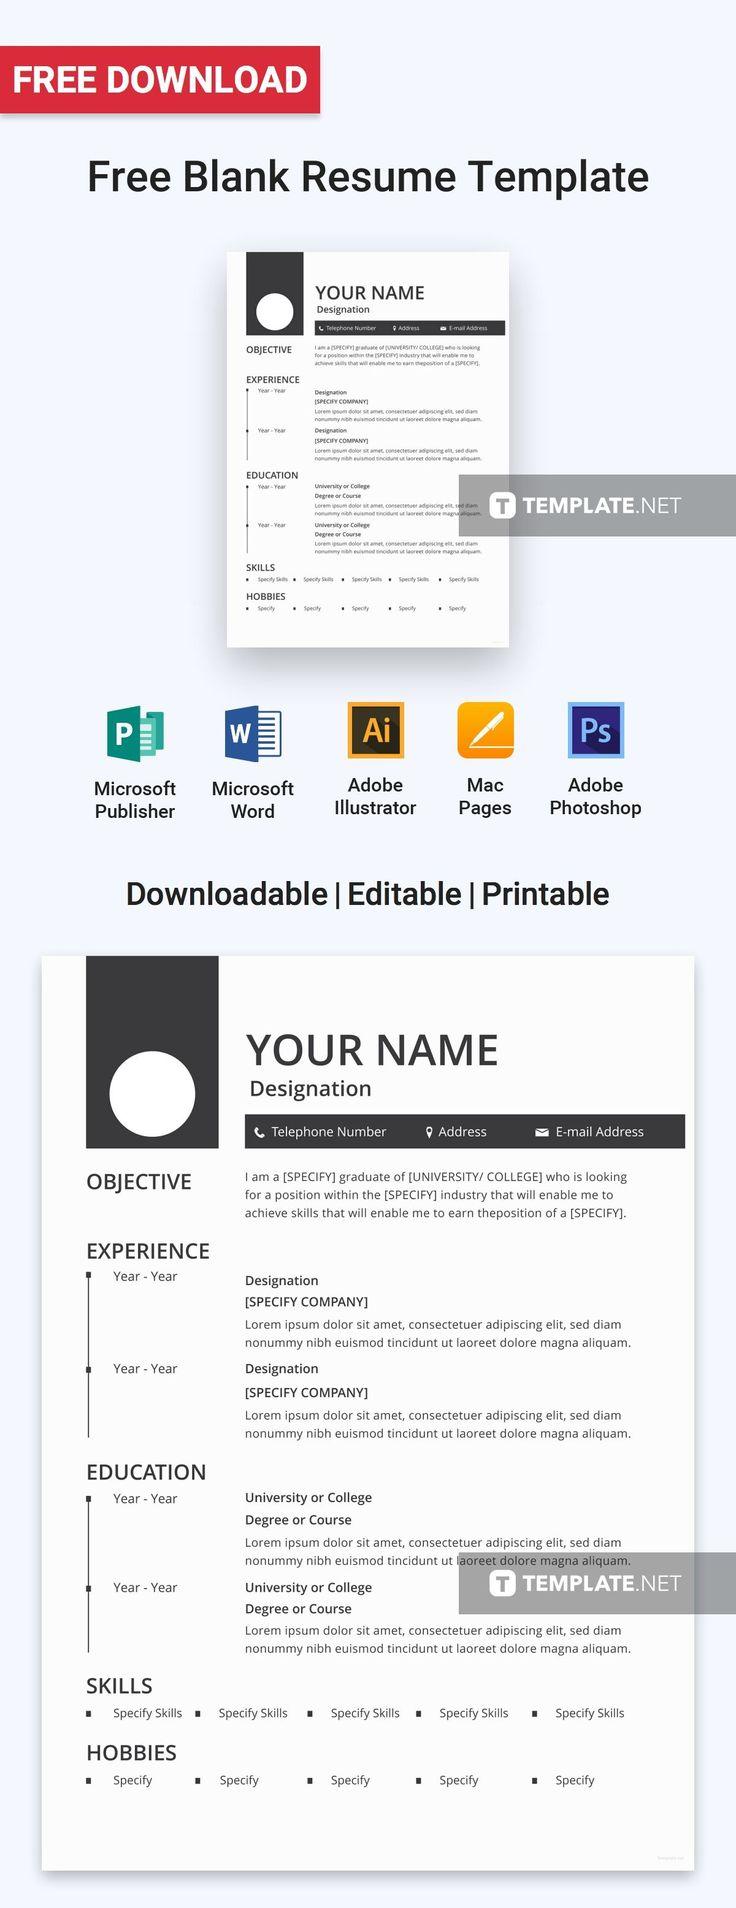 Free Blank Resume Programming Free printable resume